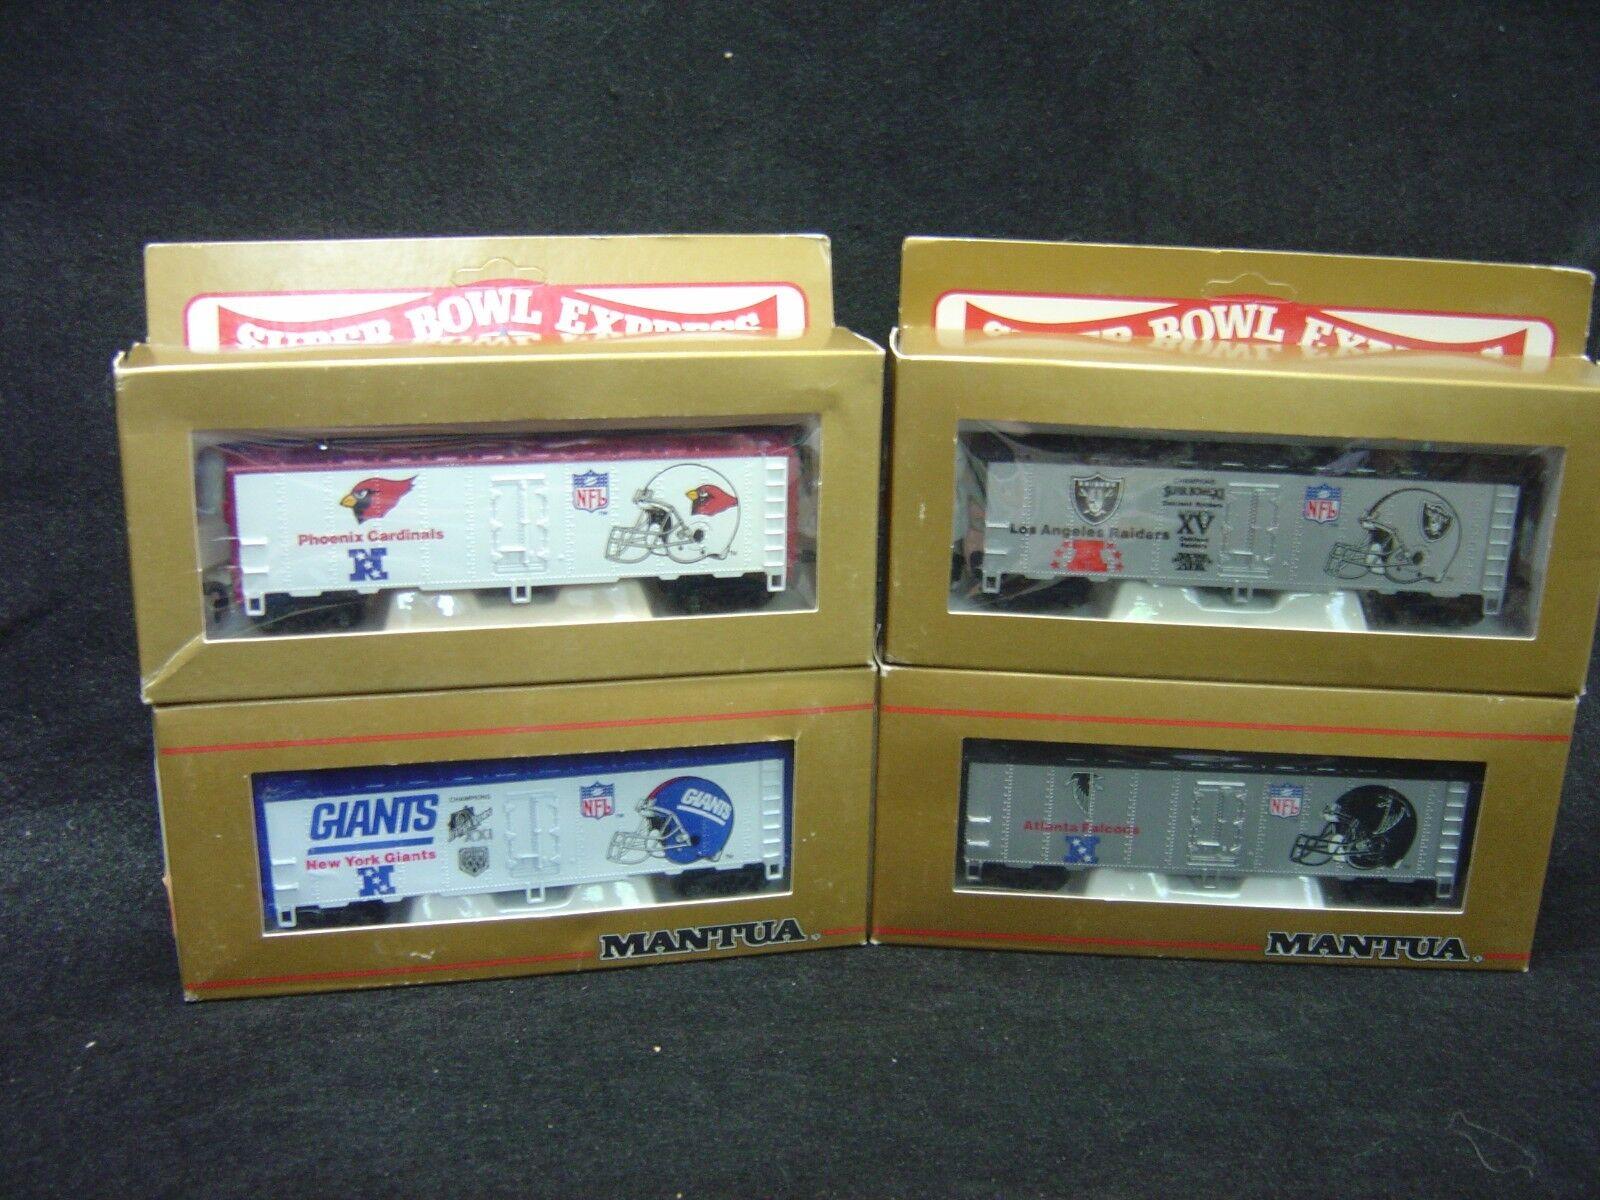 NEW HO Mantua NFL Superbowl express box cars set of 4